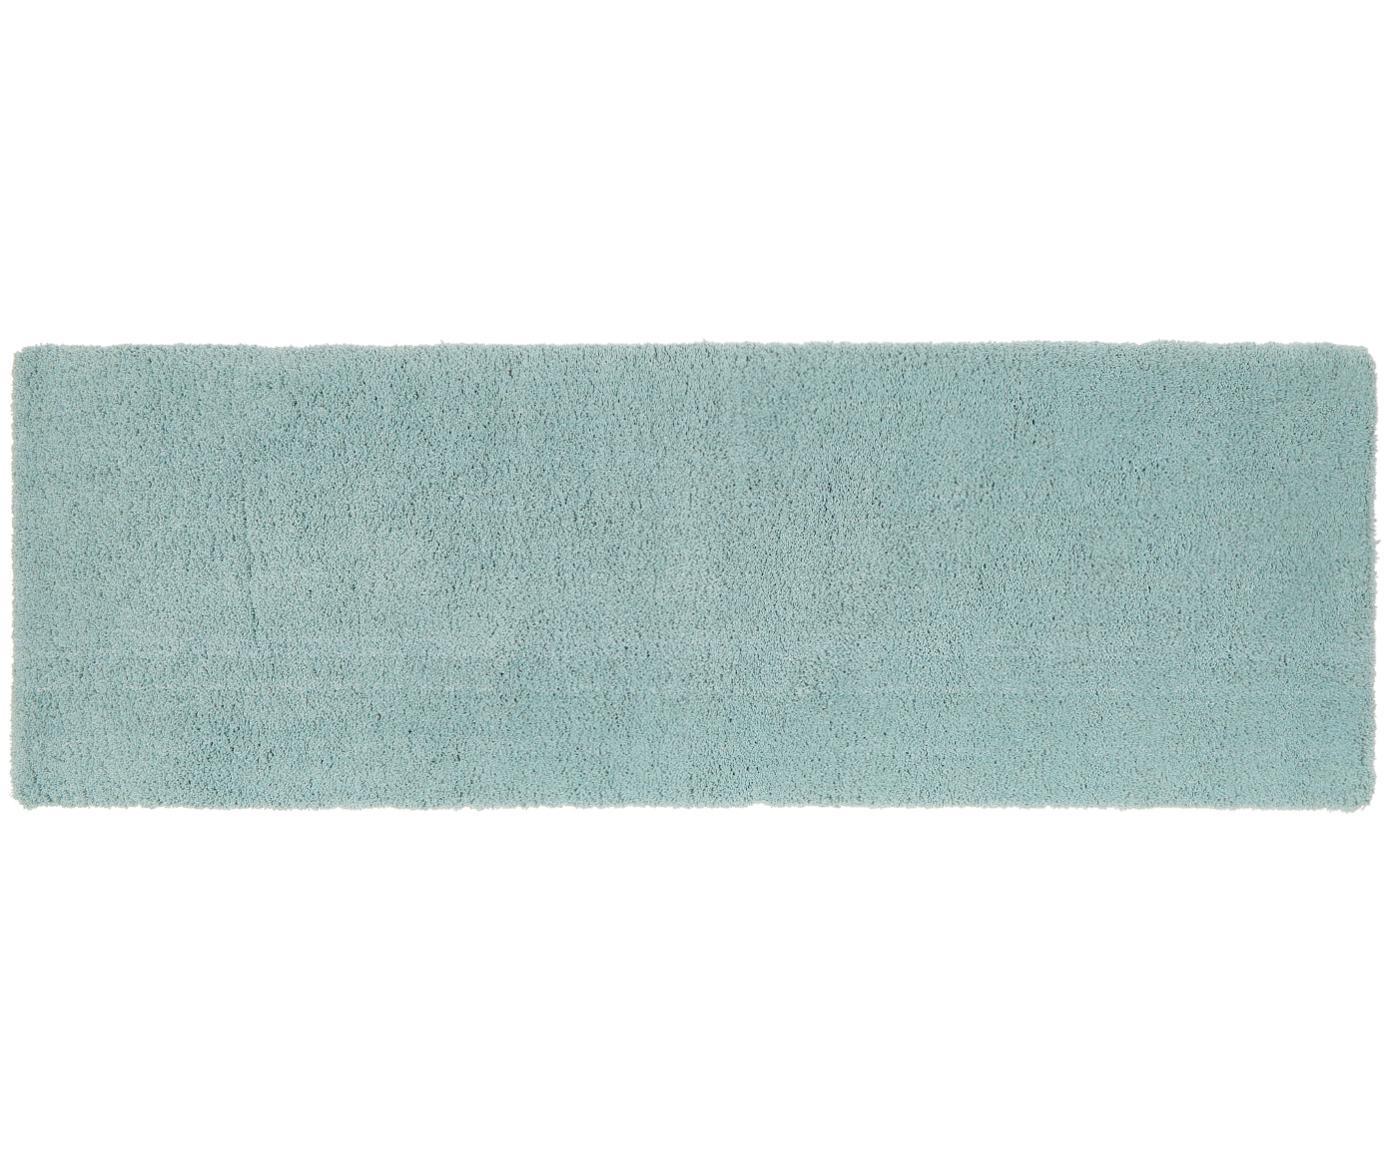 Flauschiger Hochflor-Läufer Leighton in Mintgrün, Flor: 100% Polyester (Mikrofase, Mintgrün, 80 x 250 cm